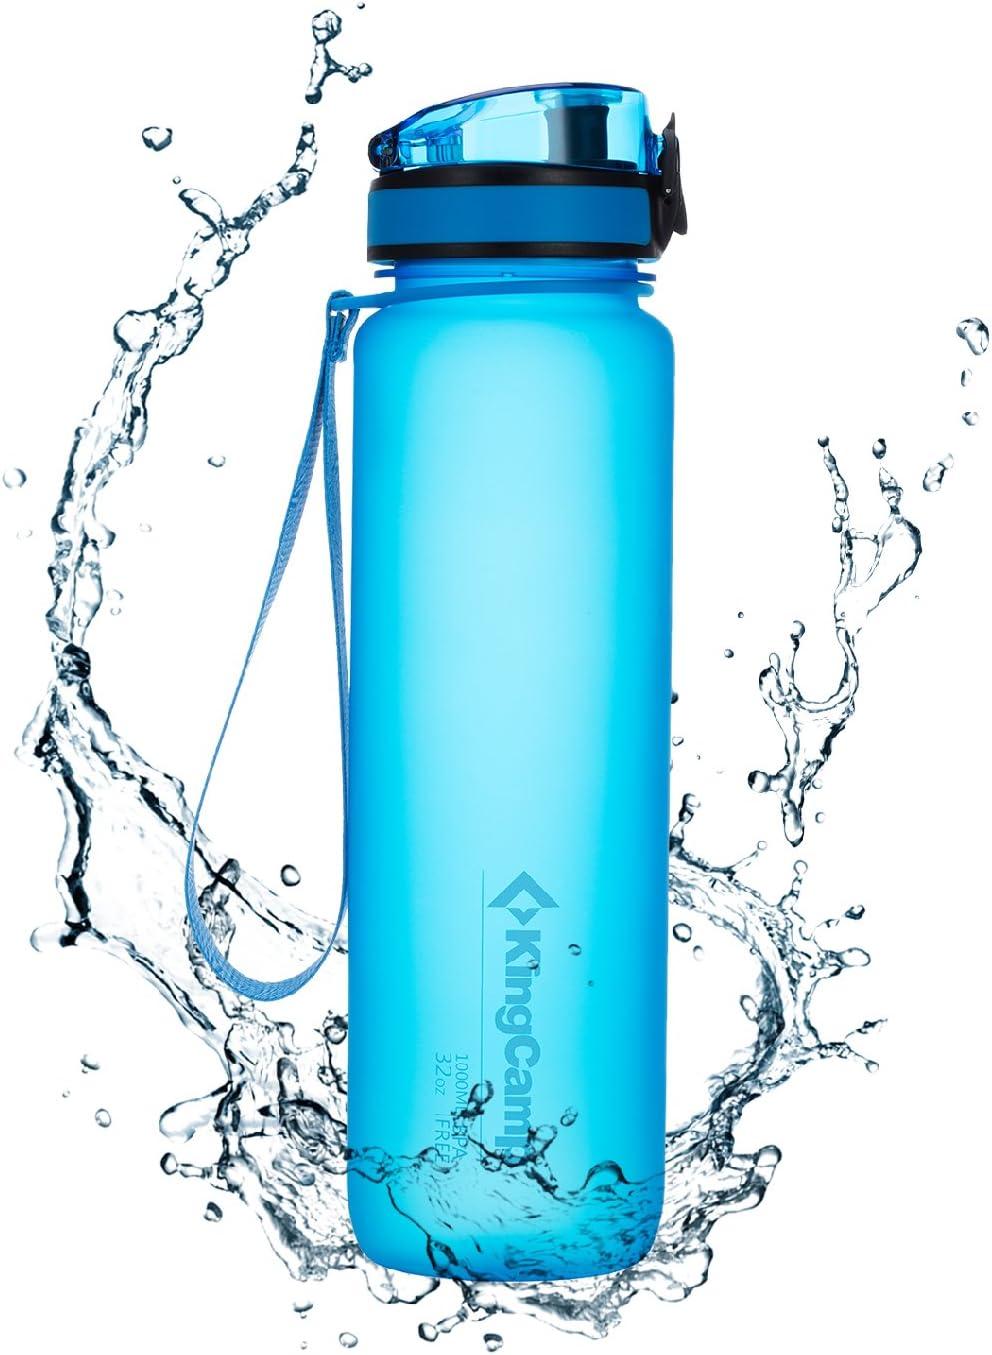 KingCamp Botella de Agua Deportiva Bicicleta para Niños Plástico Impermeable y Reutilizable 500ml/650ml/1000ml sin BPA